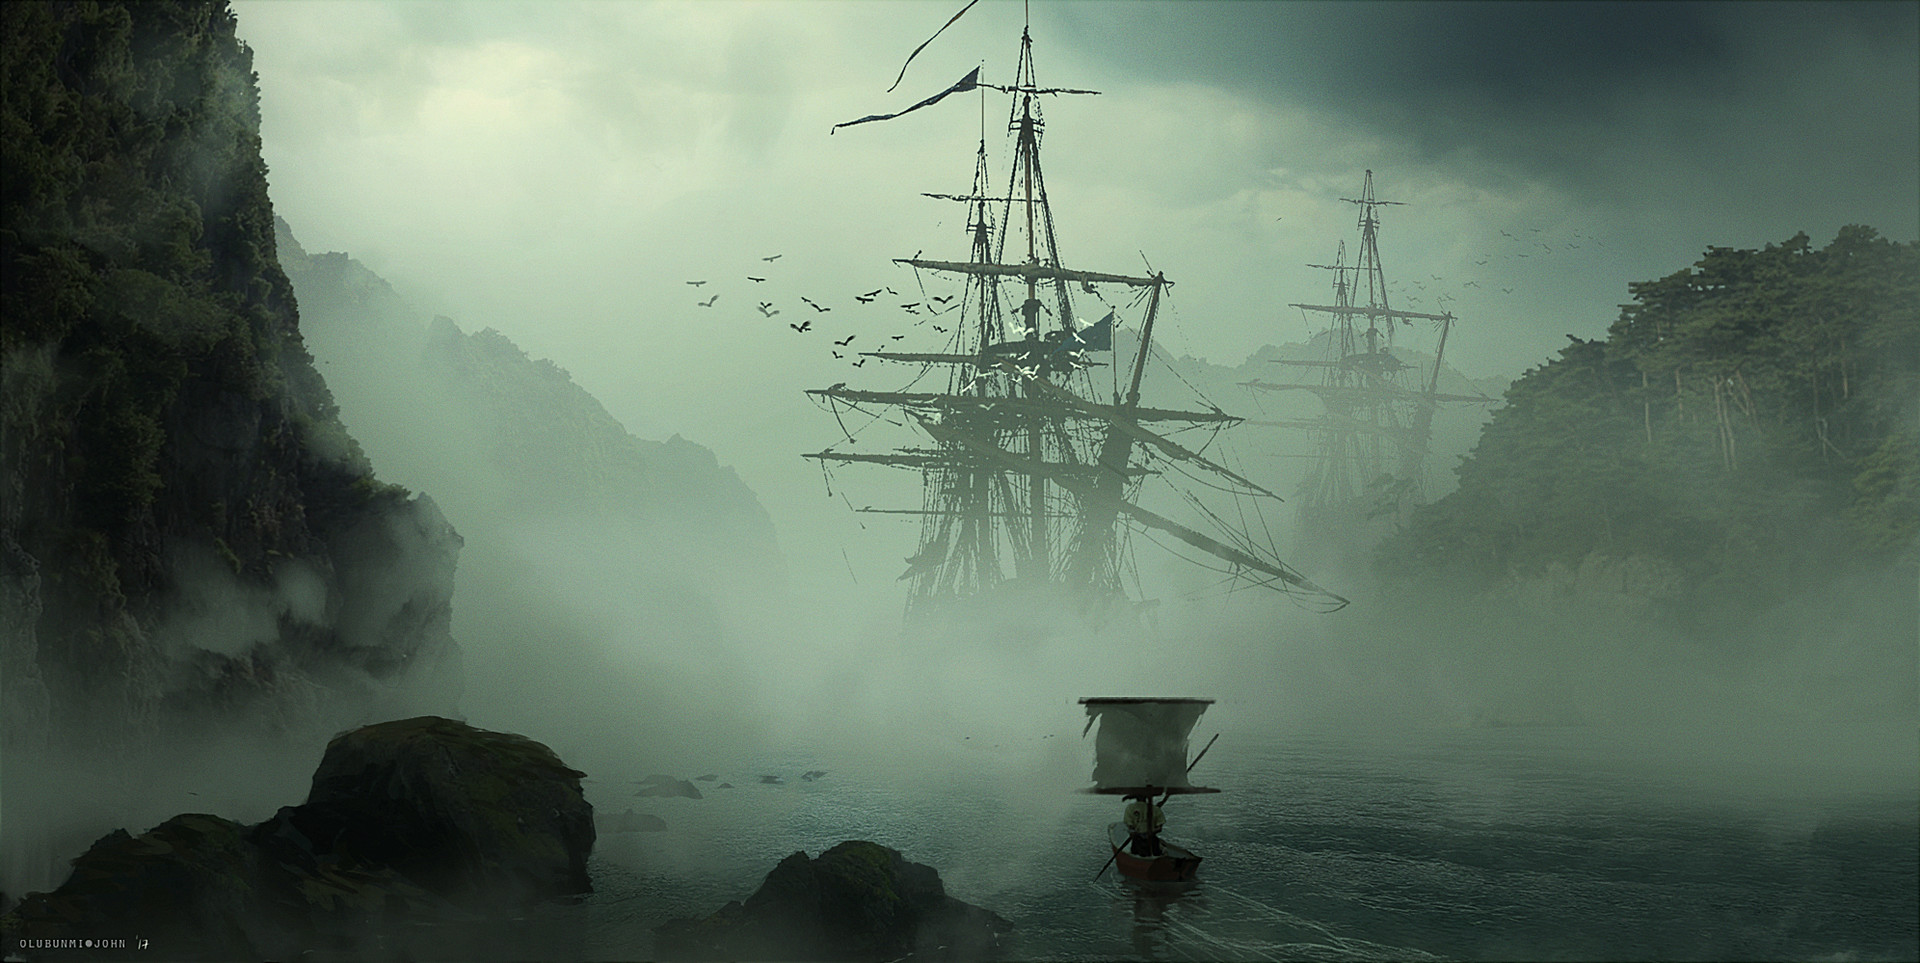 Olubunmi john giant ship final